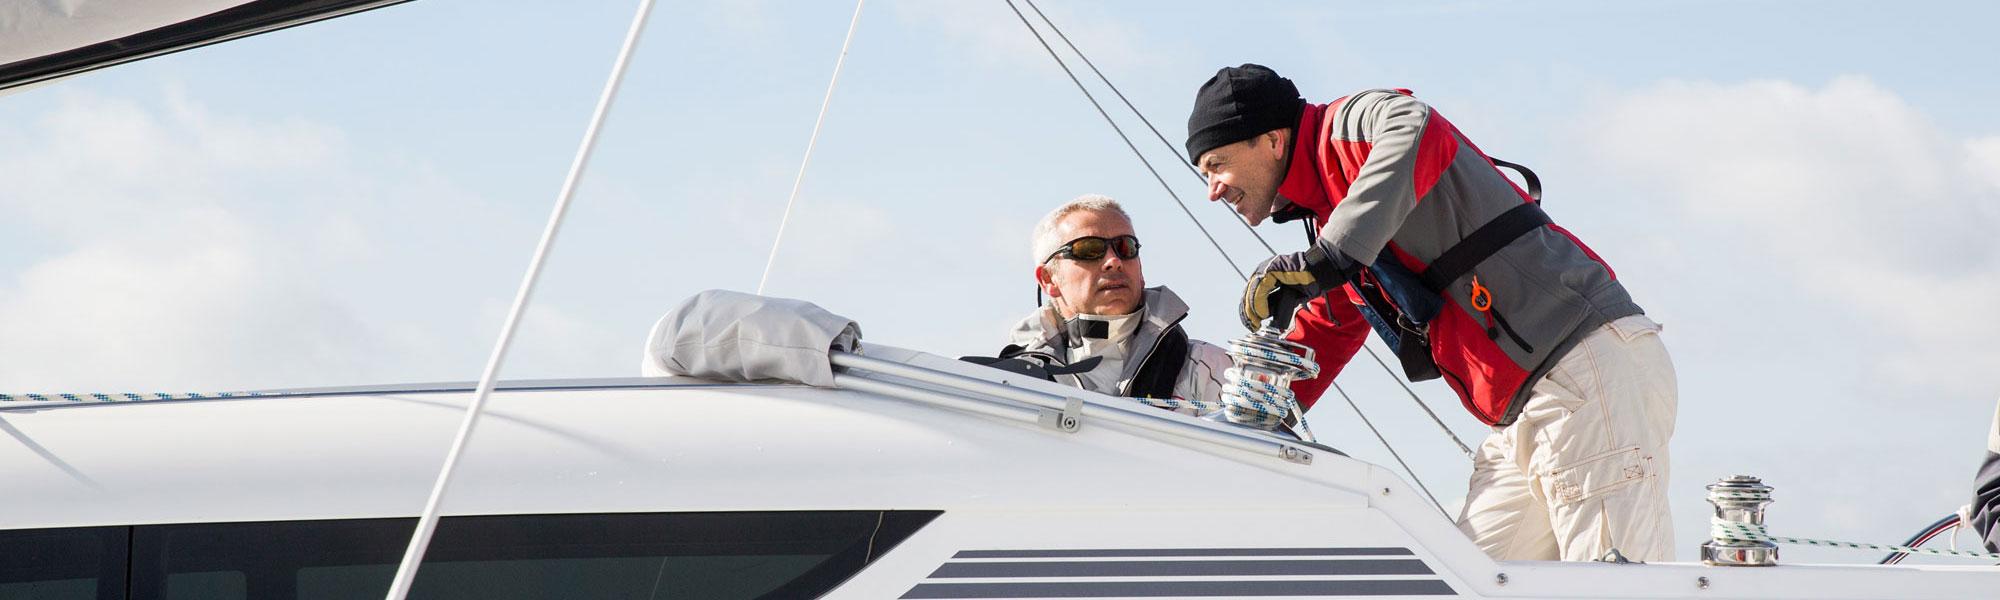 Sail training on Dragonfly 32 trimaran